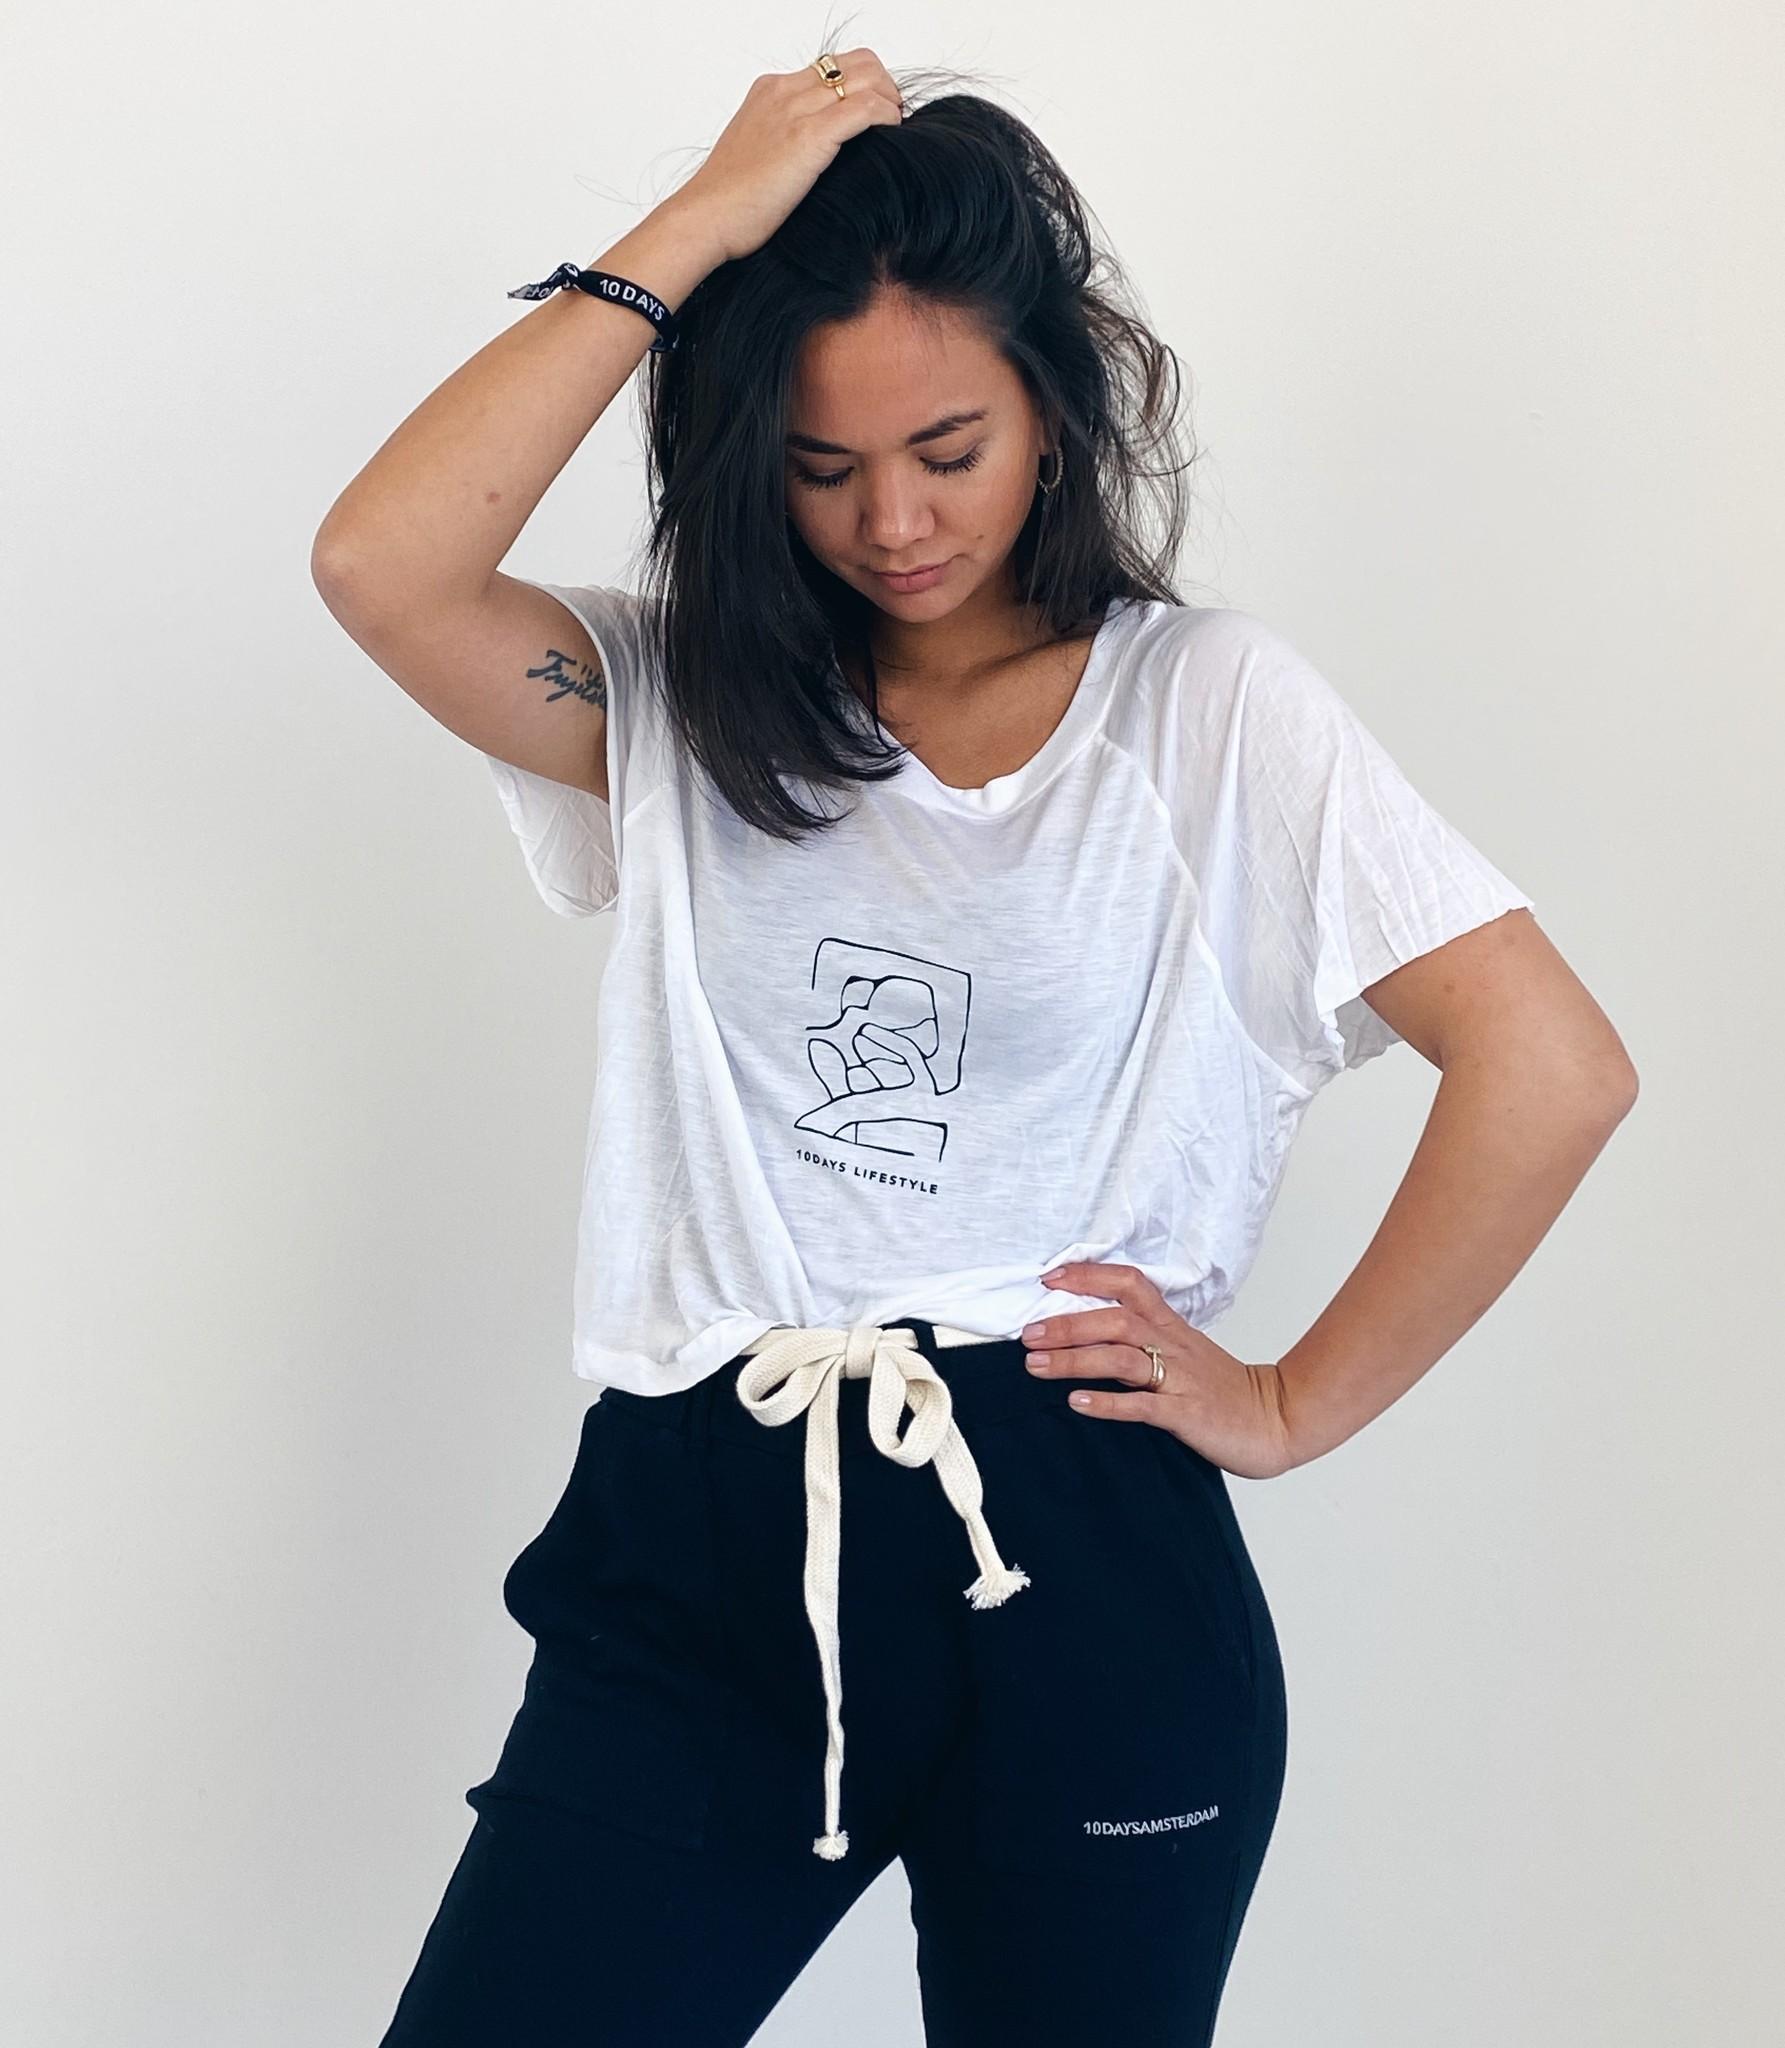 T-shirt shortsleeve tee sketch white-1